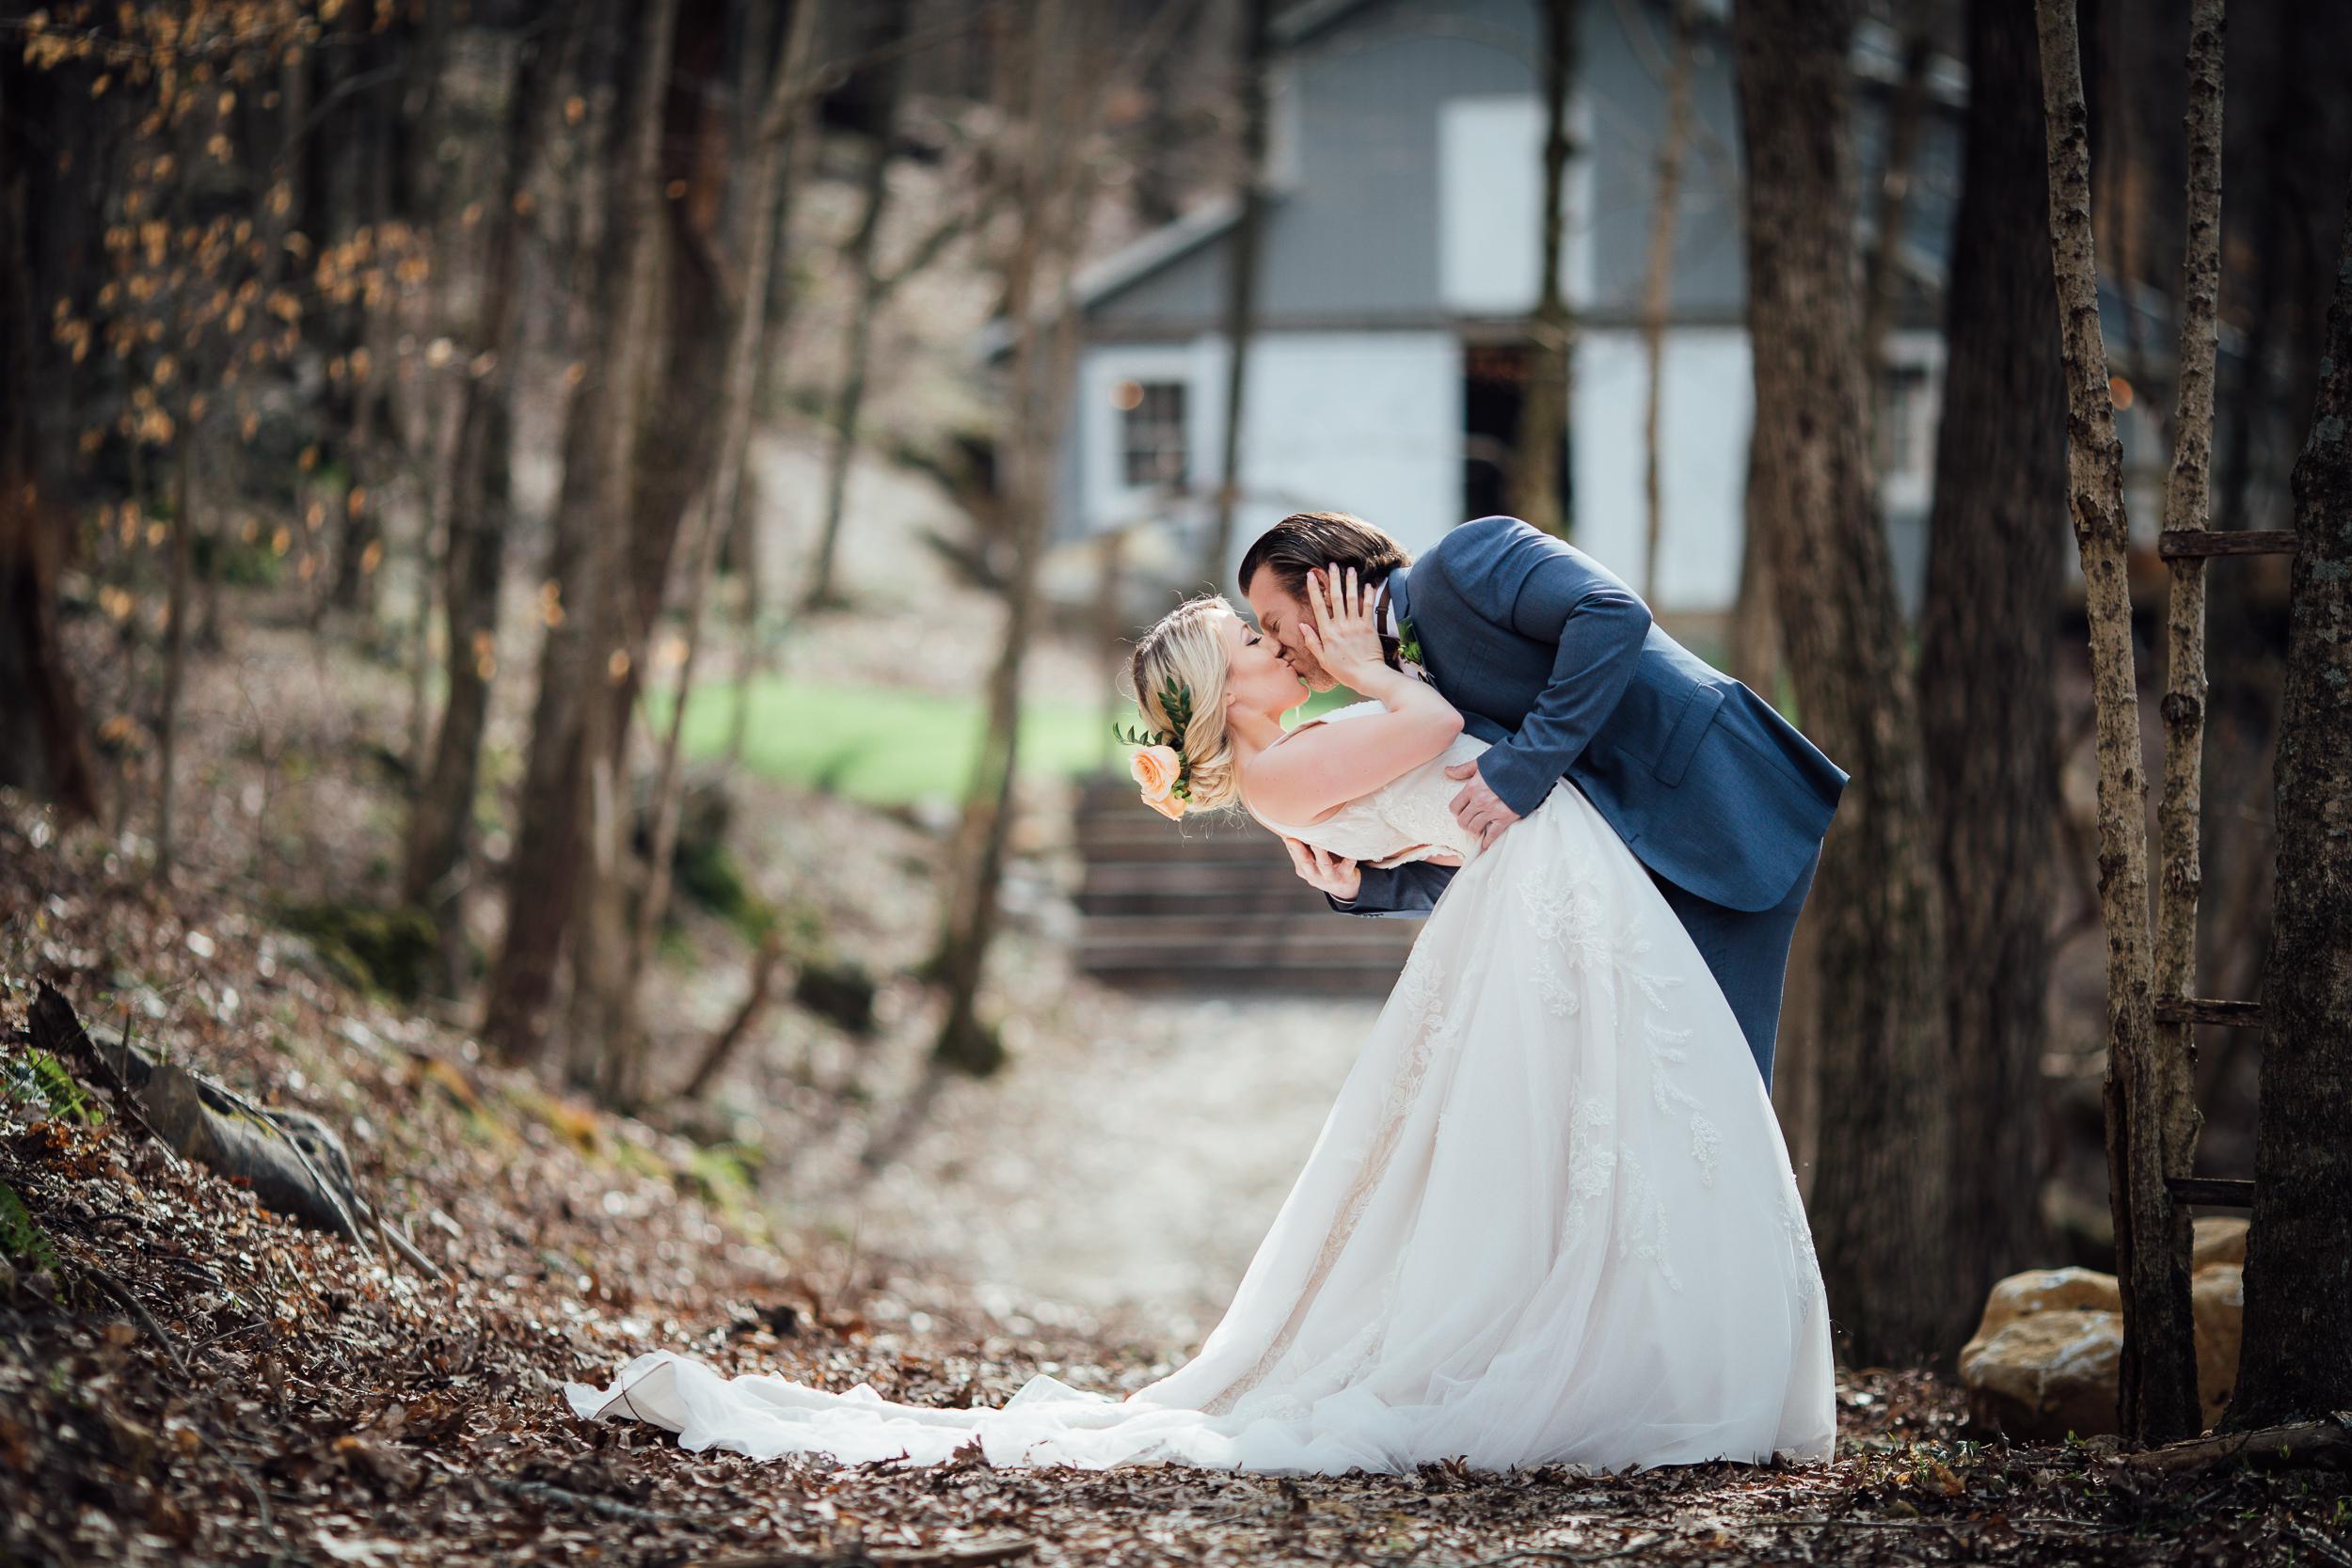 chattanooga best wedding photographer nashville wedding photography